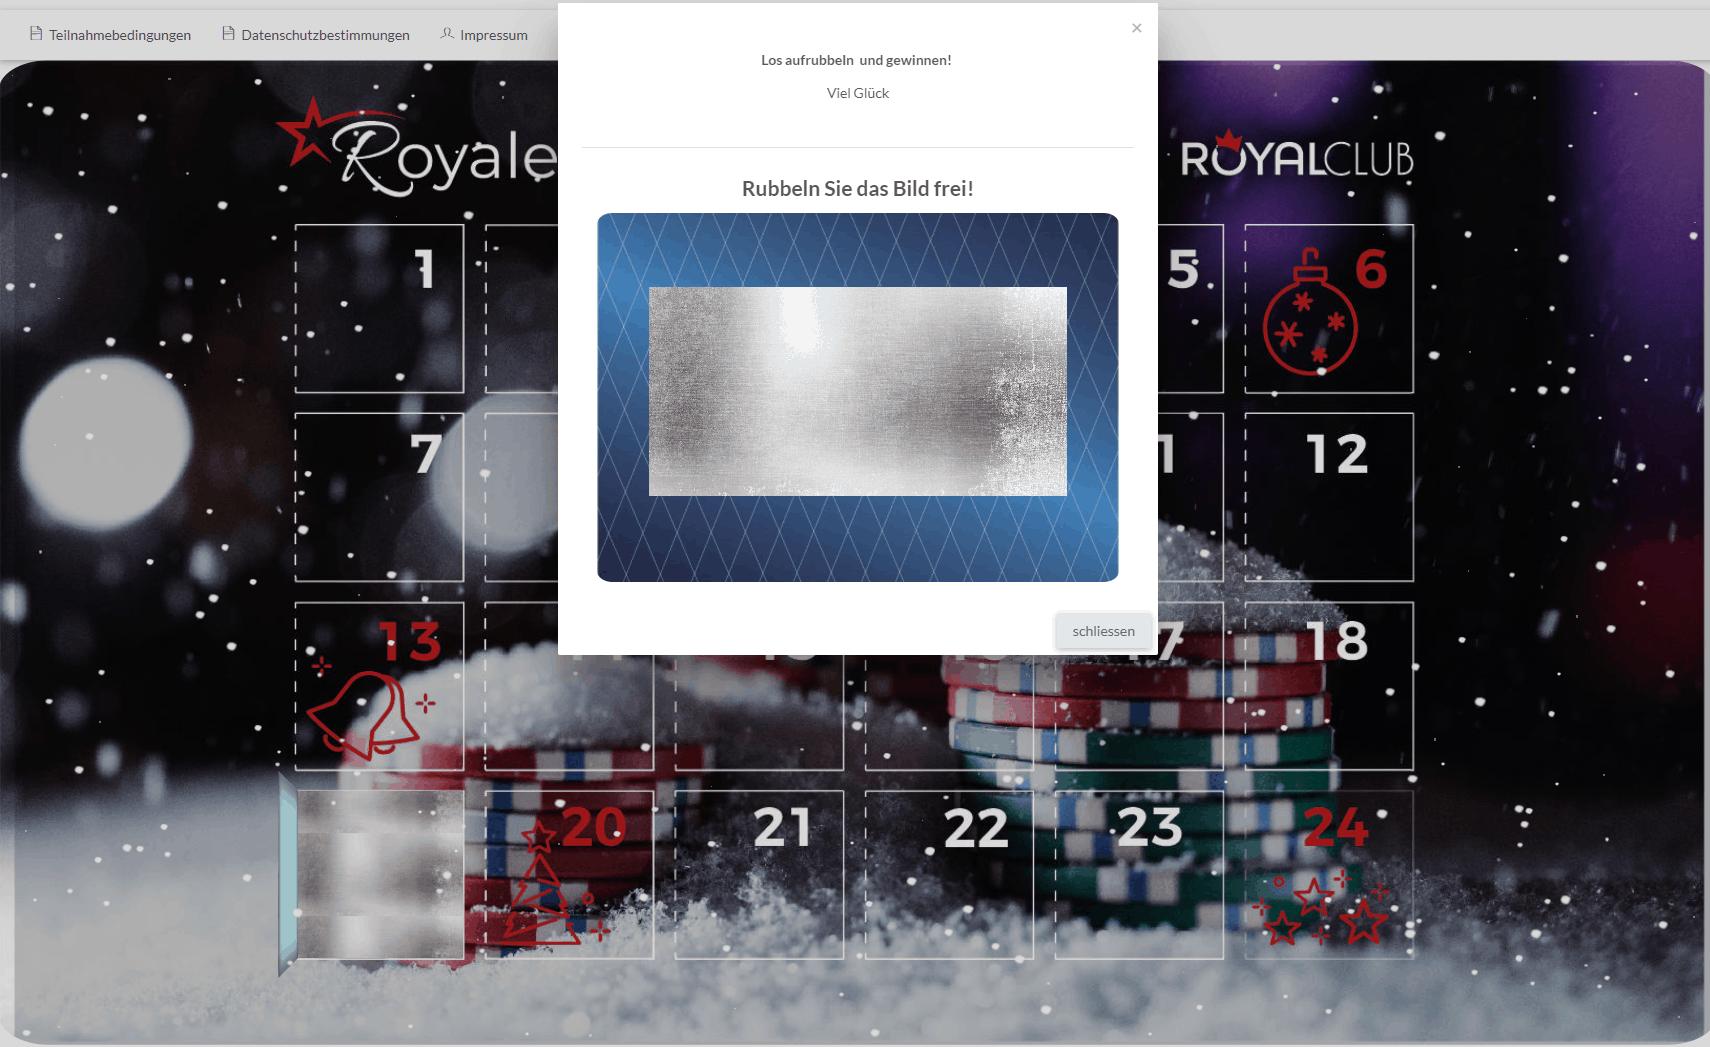 Kalender online Rubbellos - Swiss Casinos Adventskalender